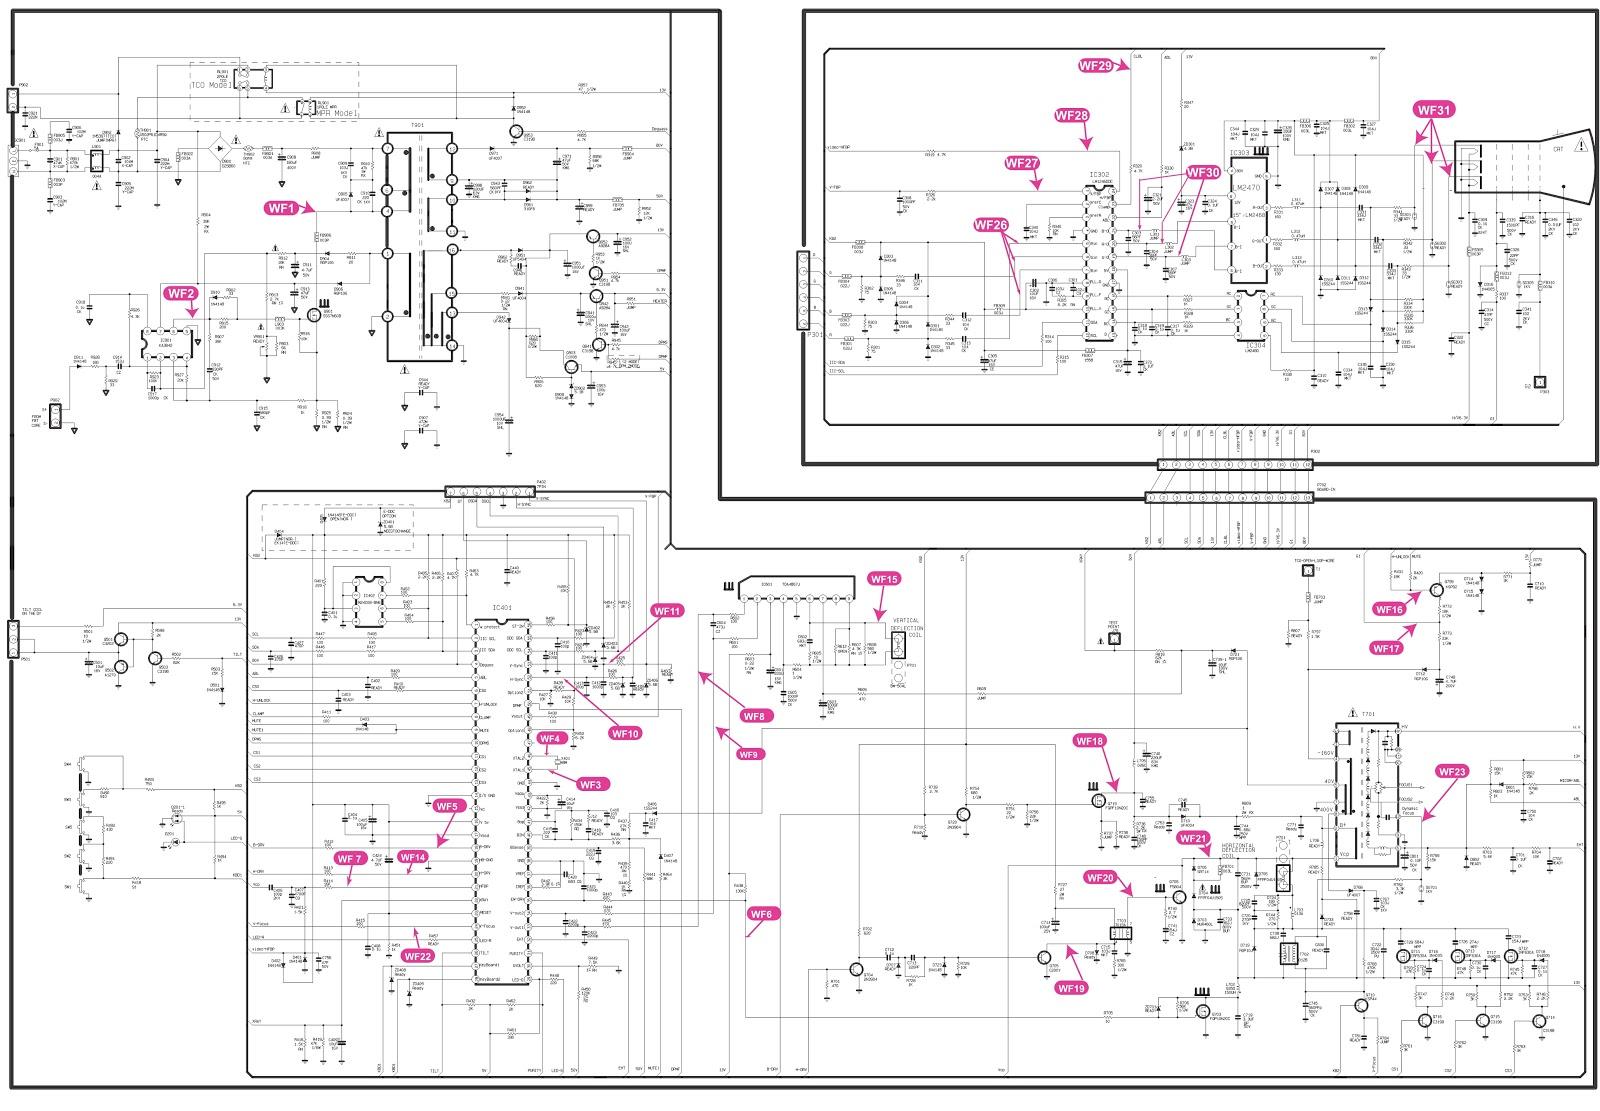 LG Flatron C17LC – 17 inch CRT MONITOR – CIRCUIT DIAGRAM